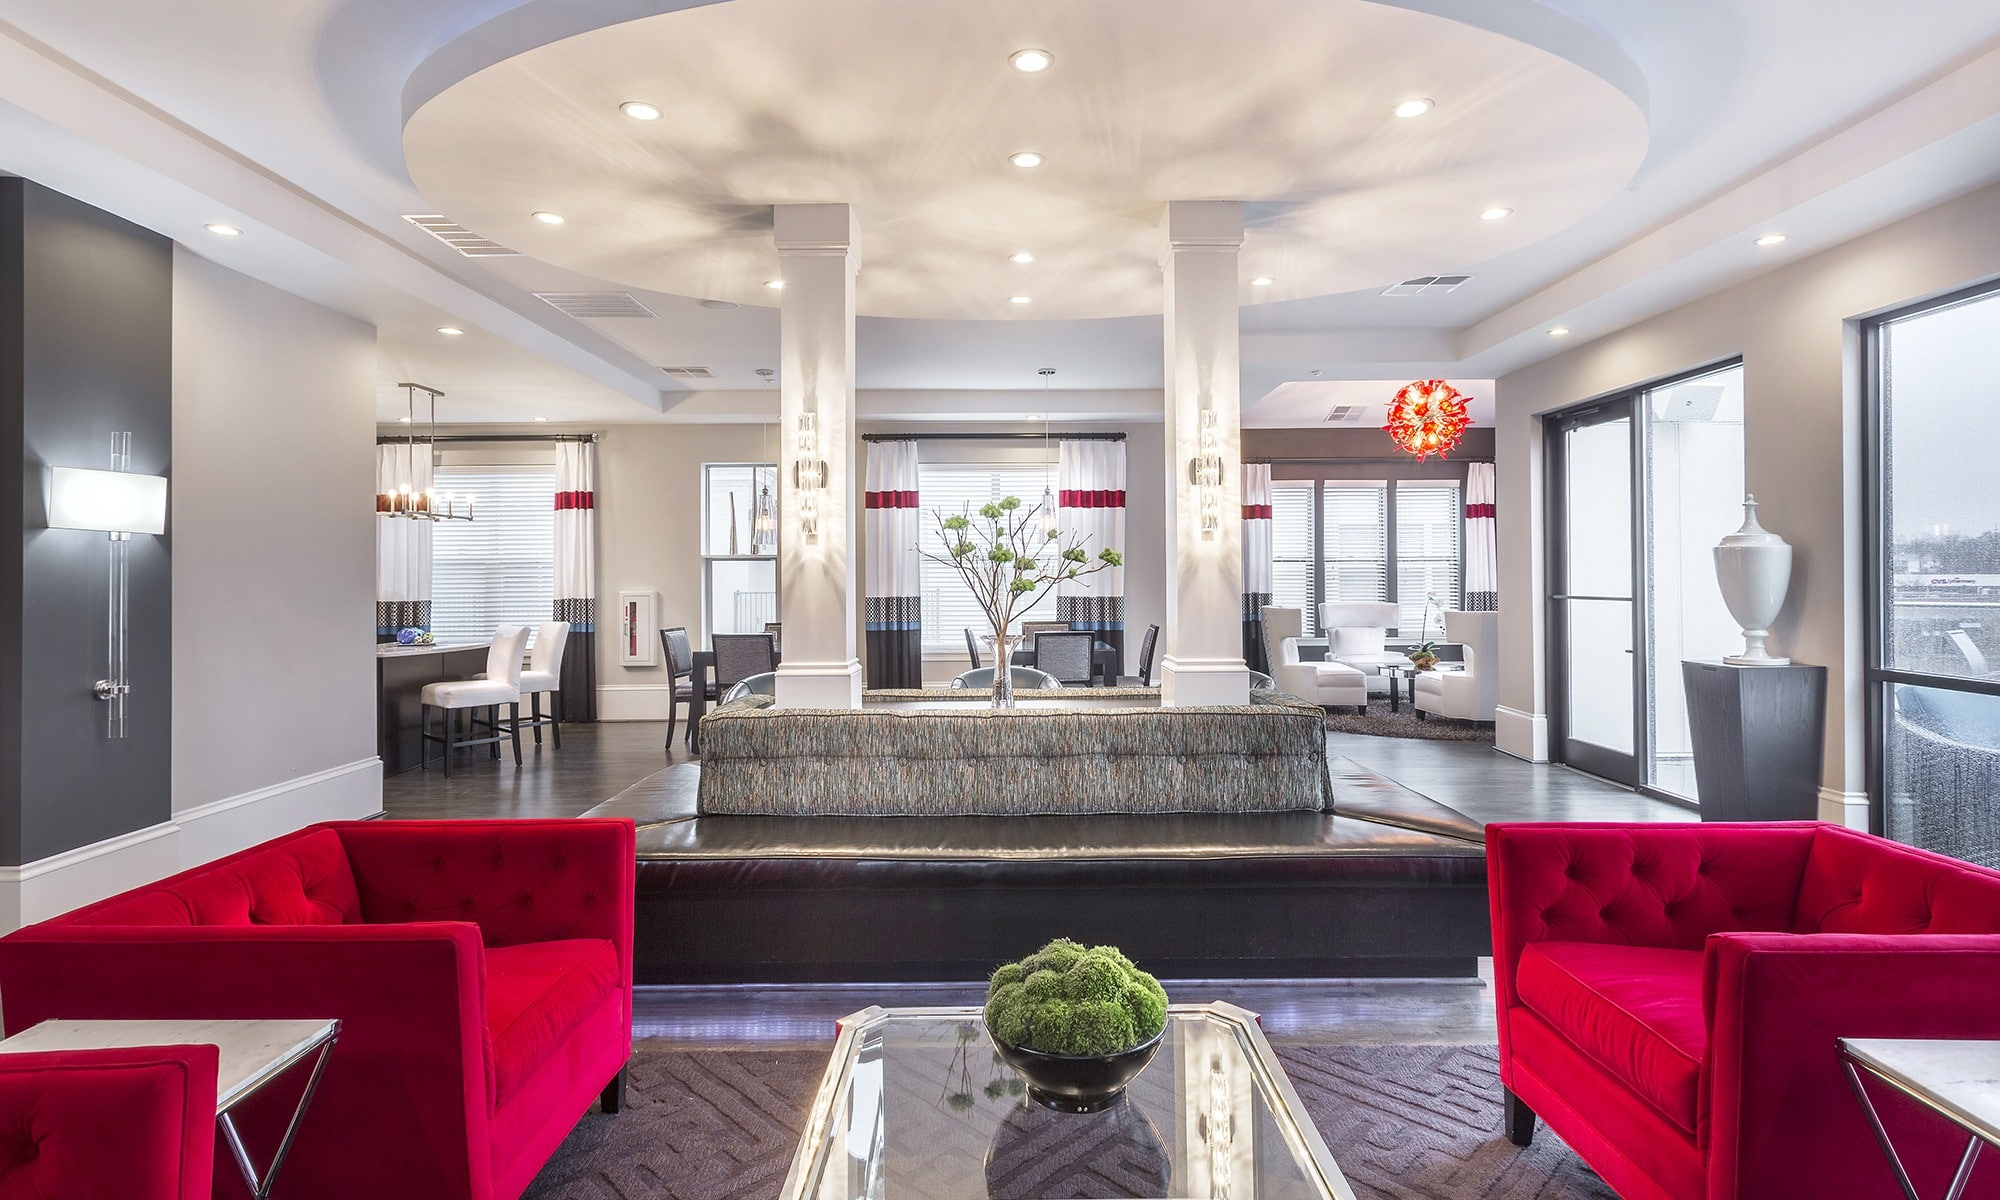 Apartments for Rent in Blue Ash Cincinnati OH